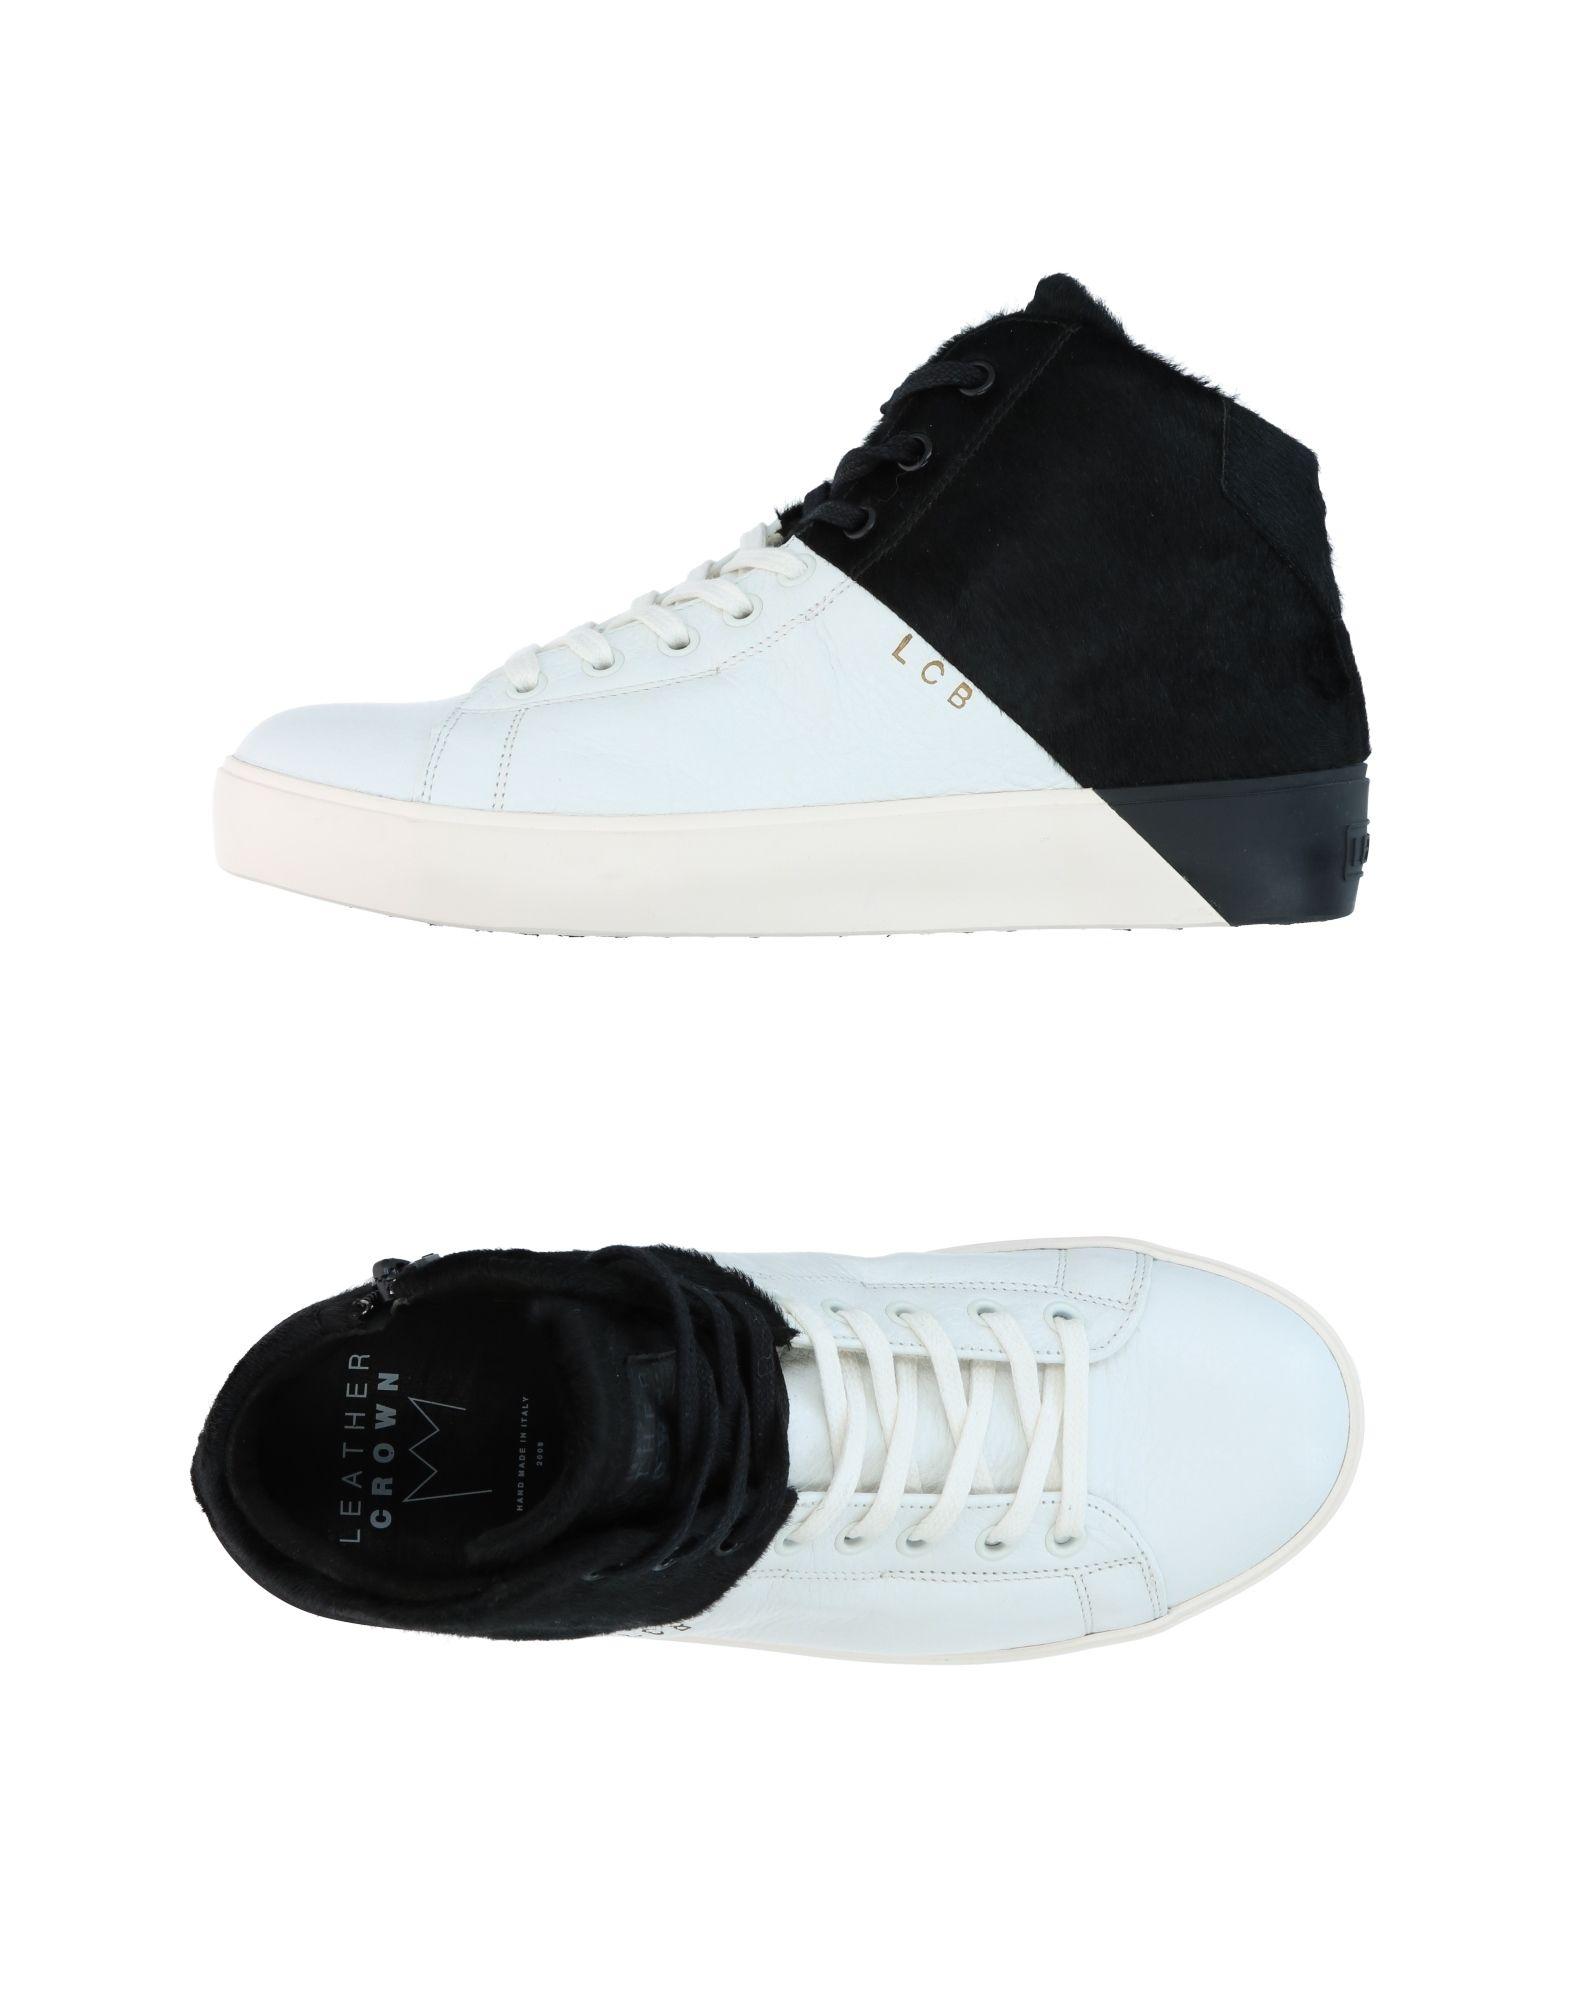 Baskets Mode Leather Crown Femme - Baskets Leather Crown Blanc Mode Baskets pas cher et belle 668817